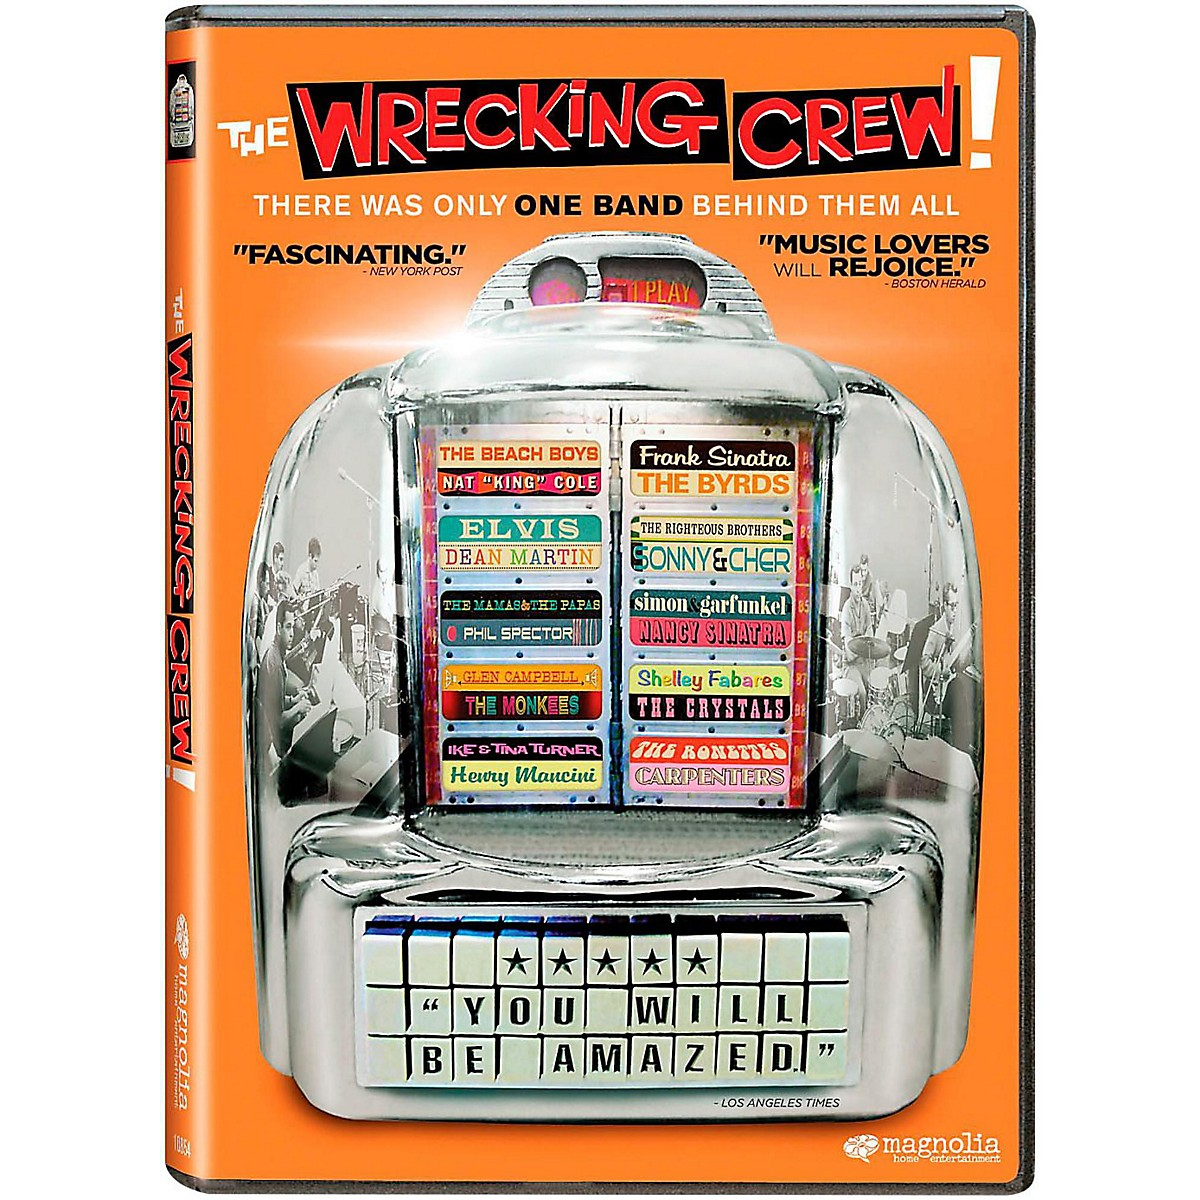 Hal Leonard The Wrecking Crew -  Documentary with Bonus Material 2 DVD Set